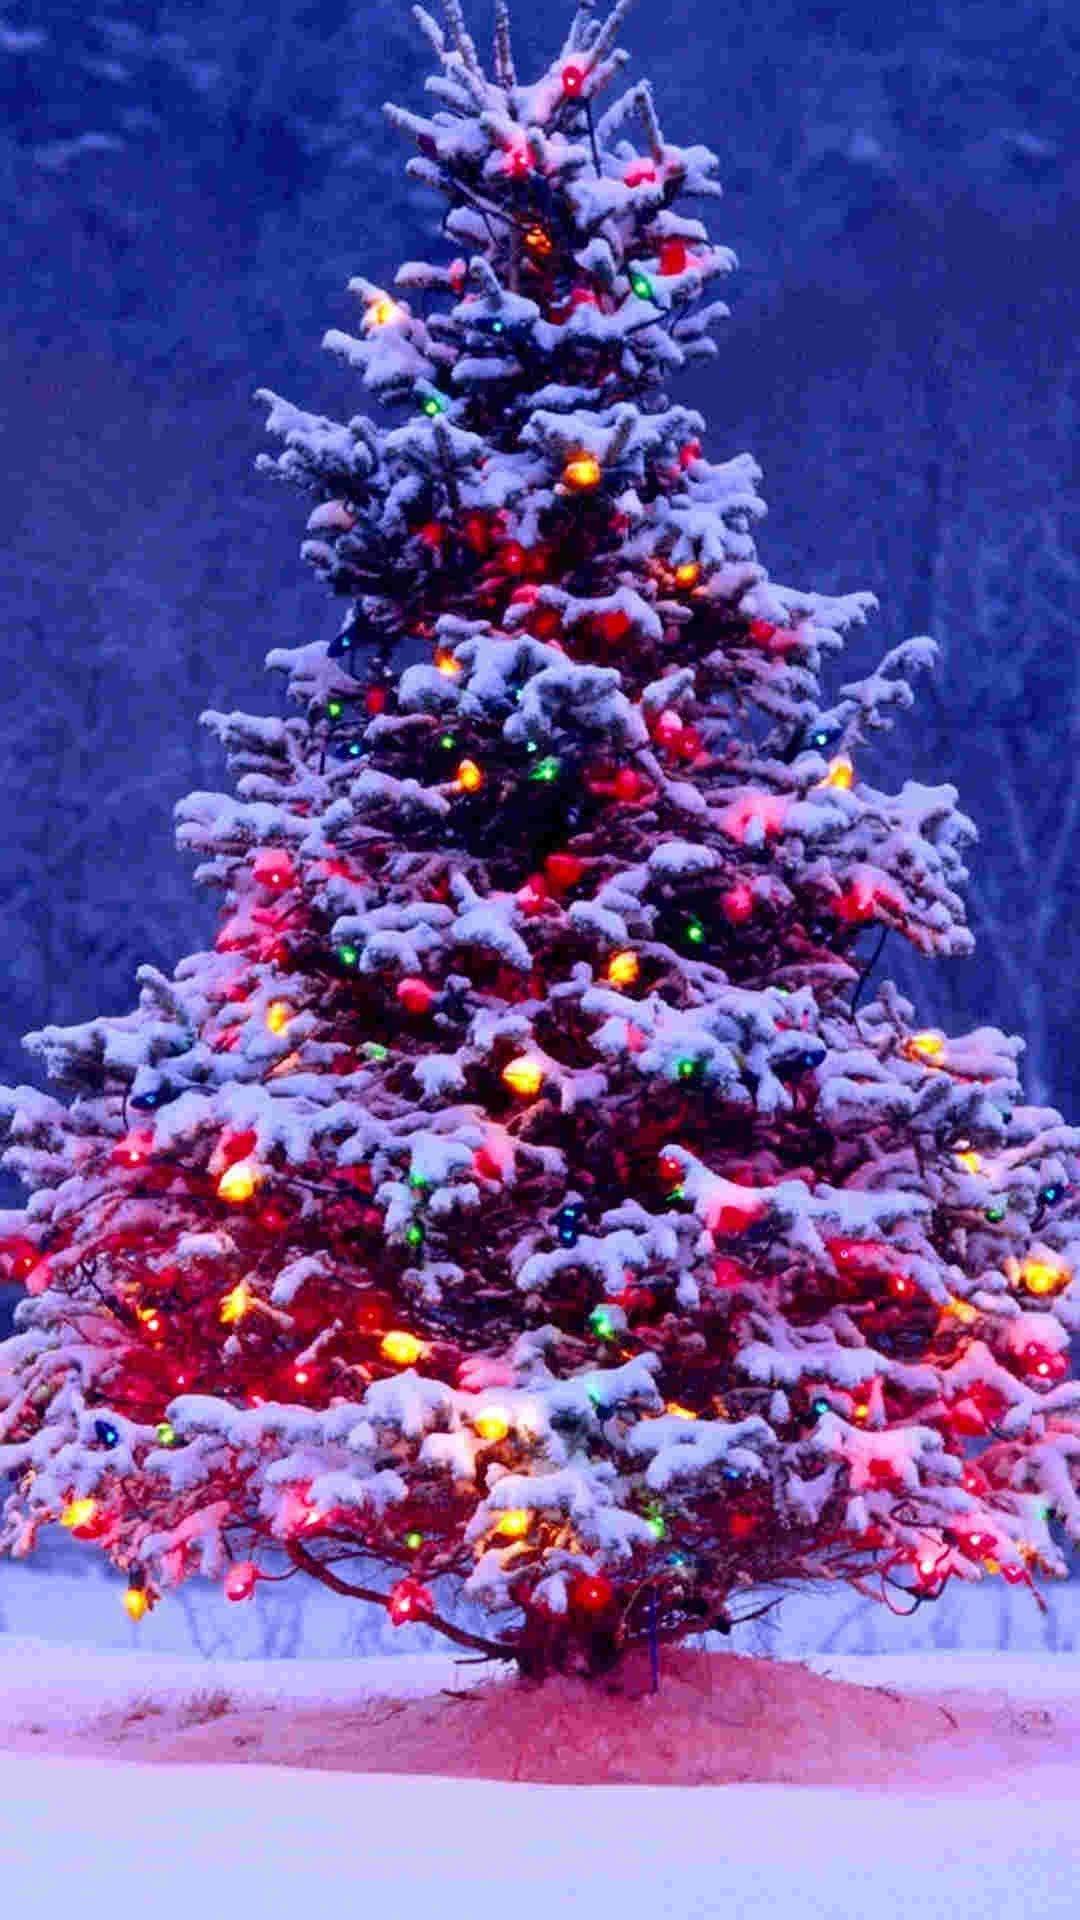 Snowy Christmas Tree.Pin On 2014 Christmas Tree Iphine 6 Plus Wallpaper